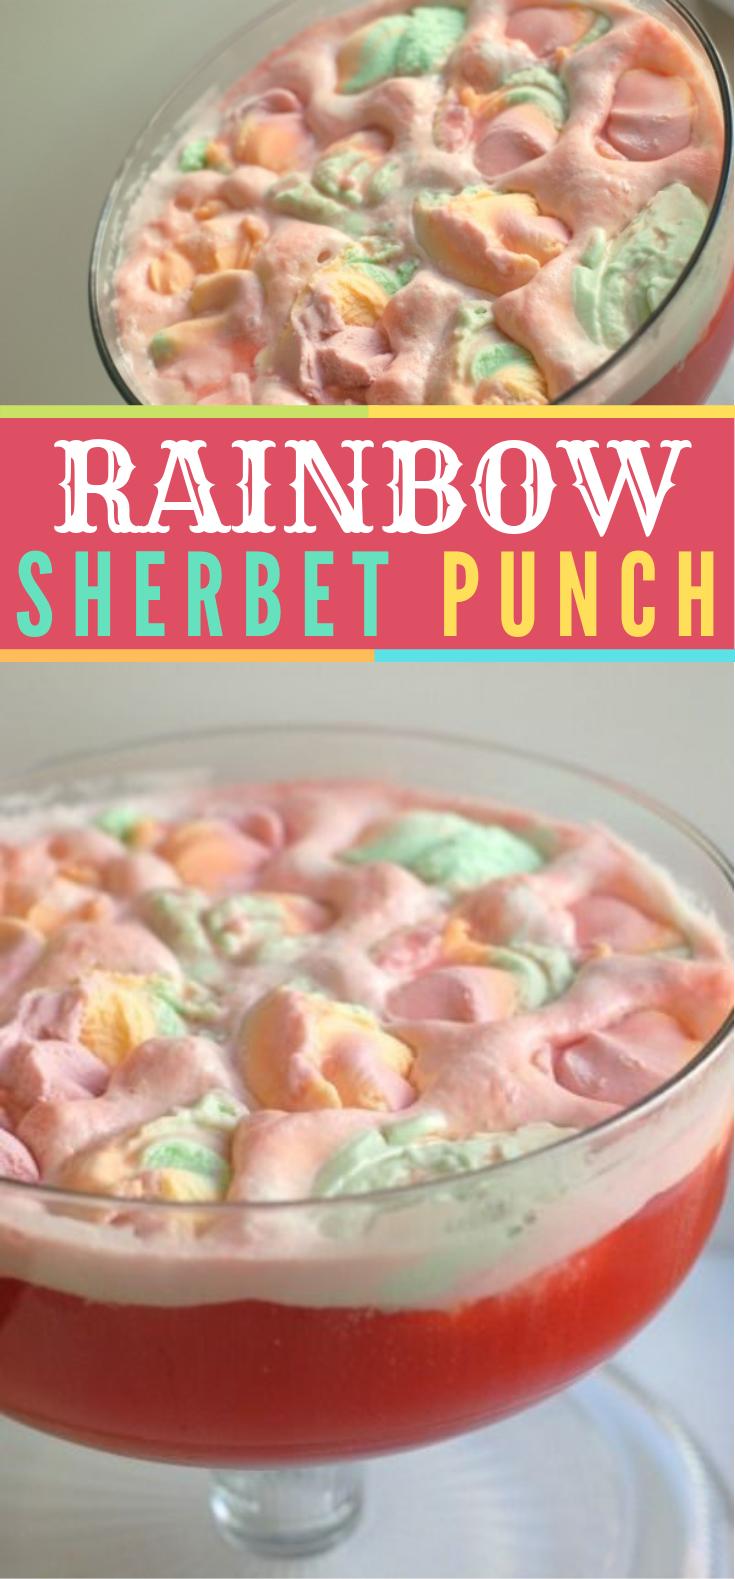 Rainbow Sherbet Punch #Drinks #Hawaiianpunch